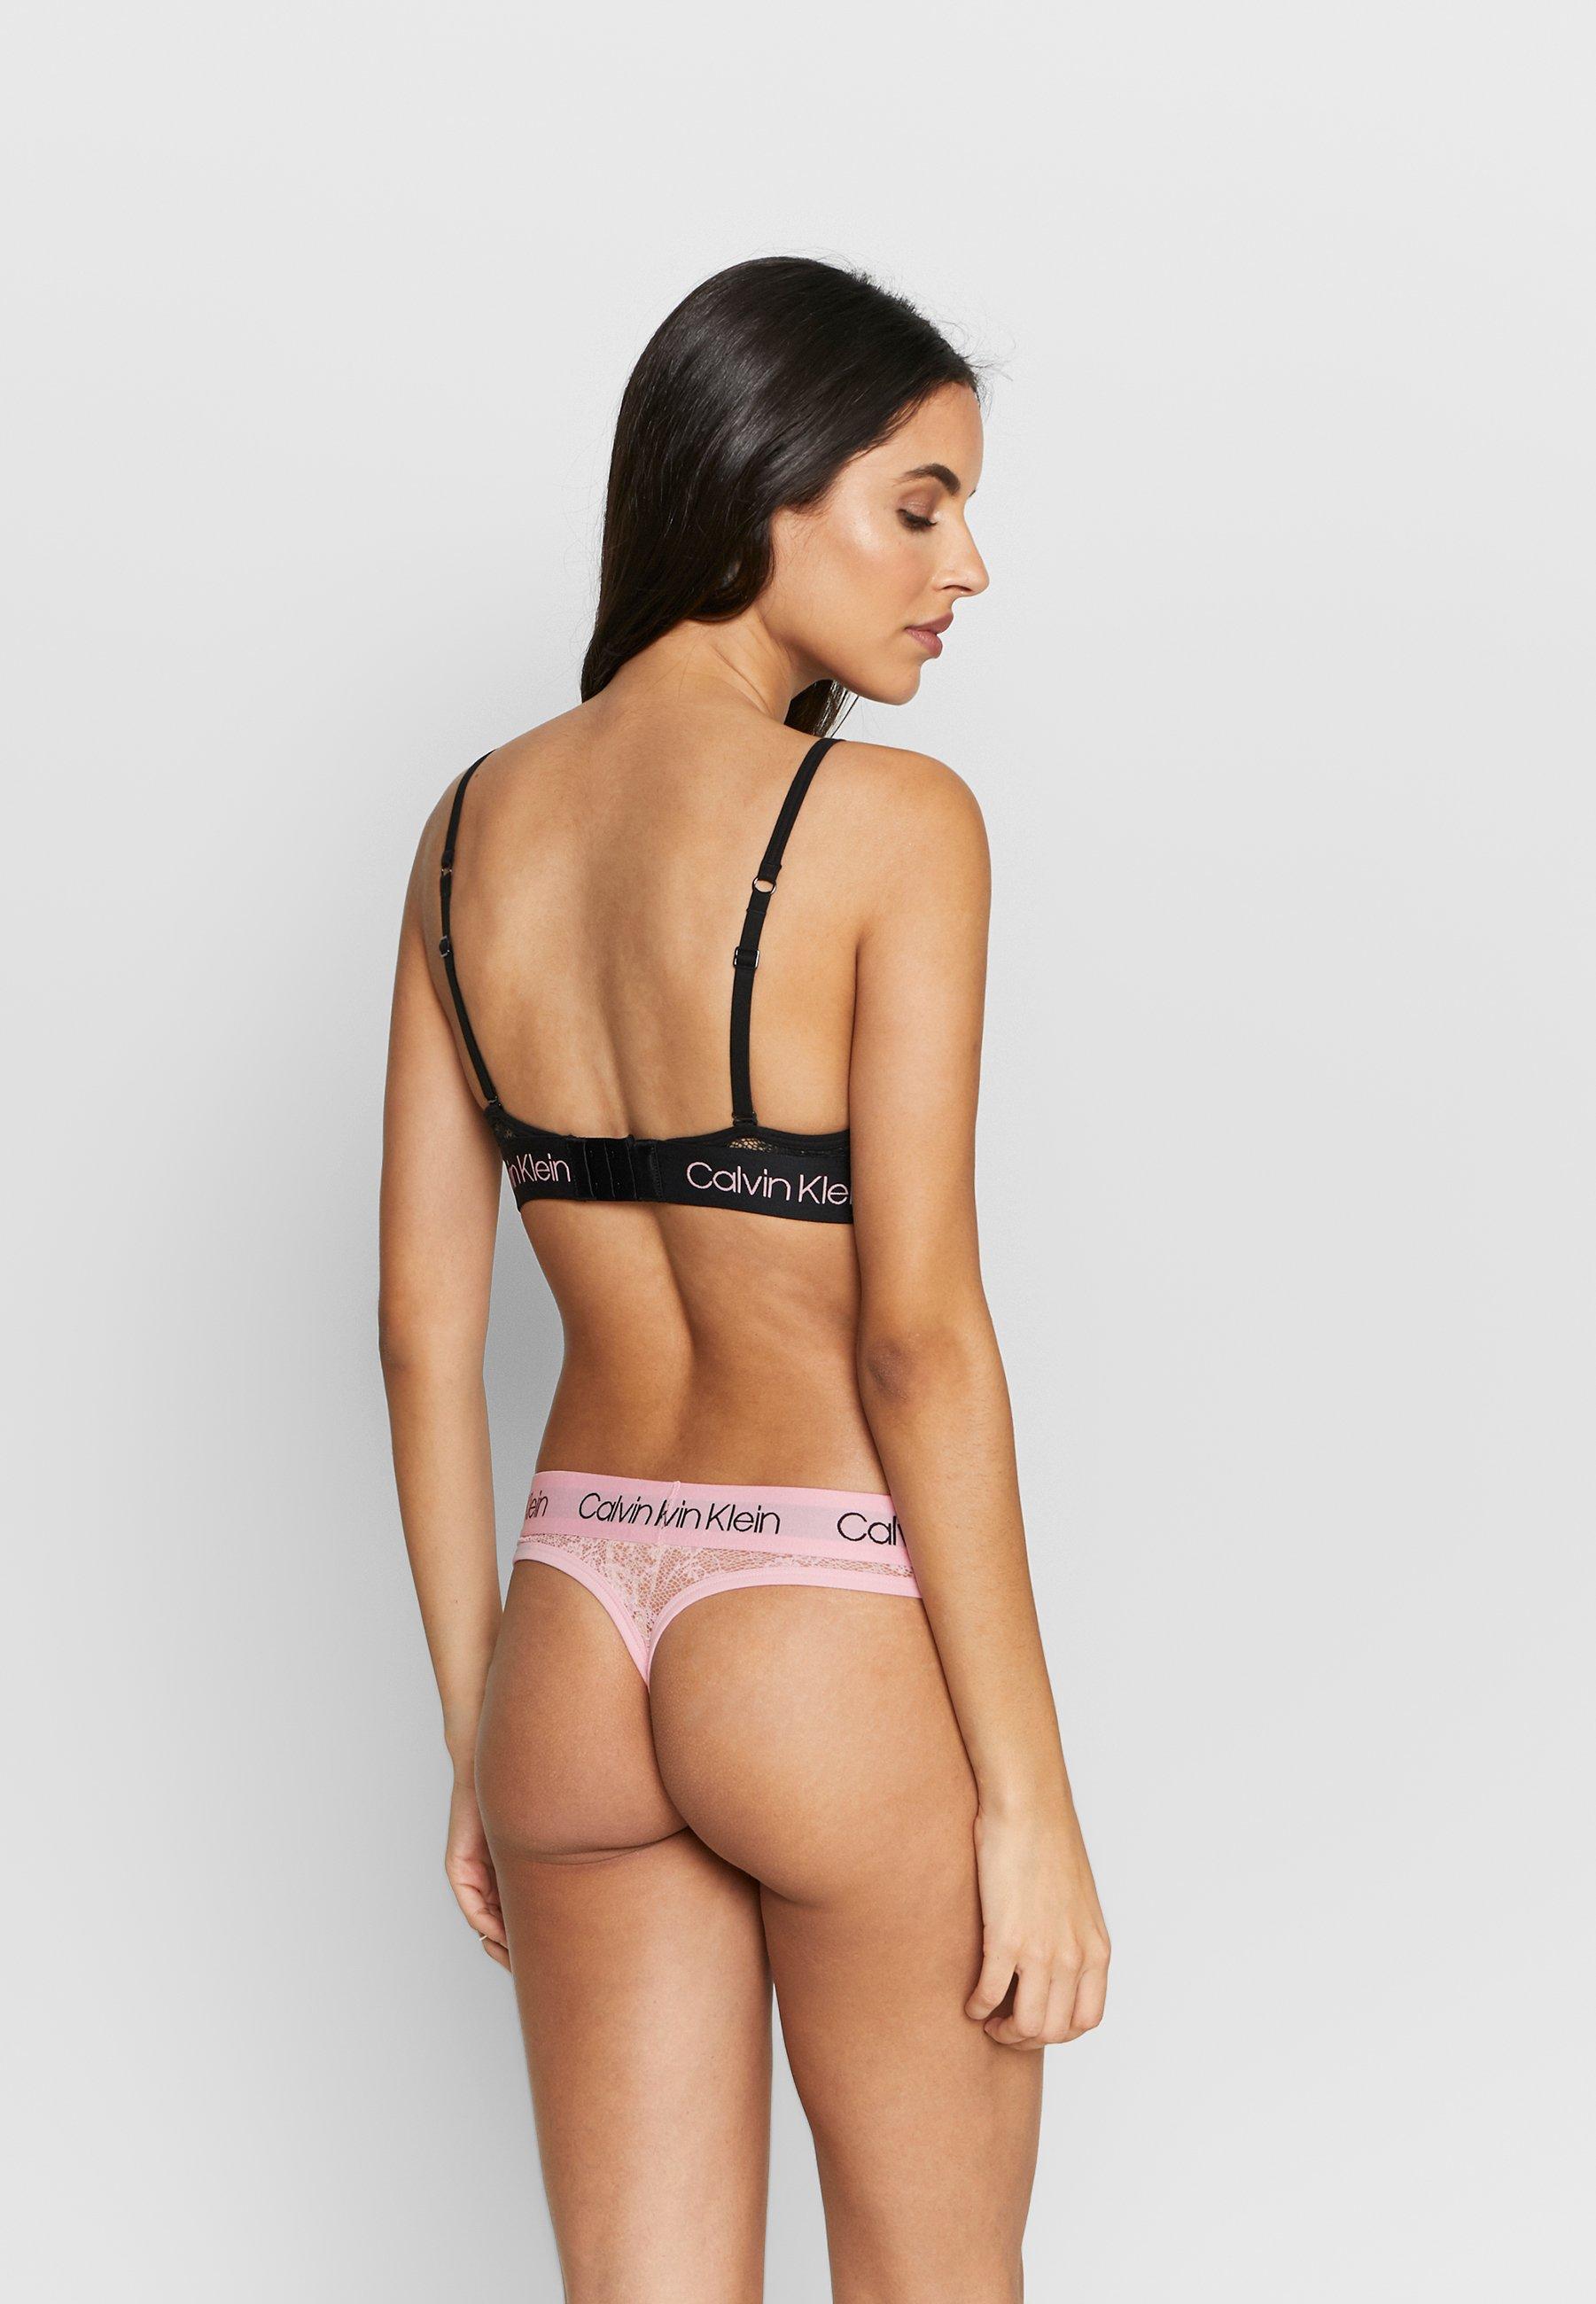 Calvin Klein Underwear V Day Capsule Unlined - Soutien-gorge Triangle Black